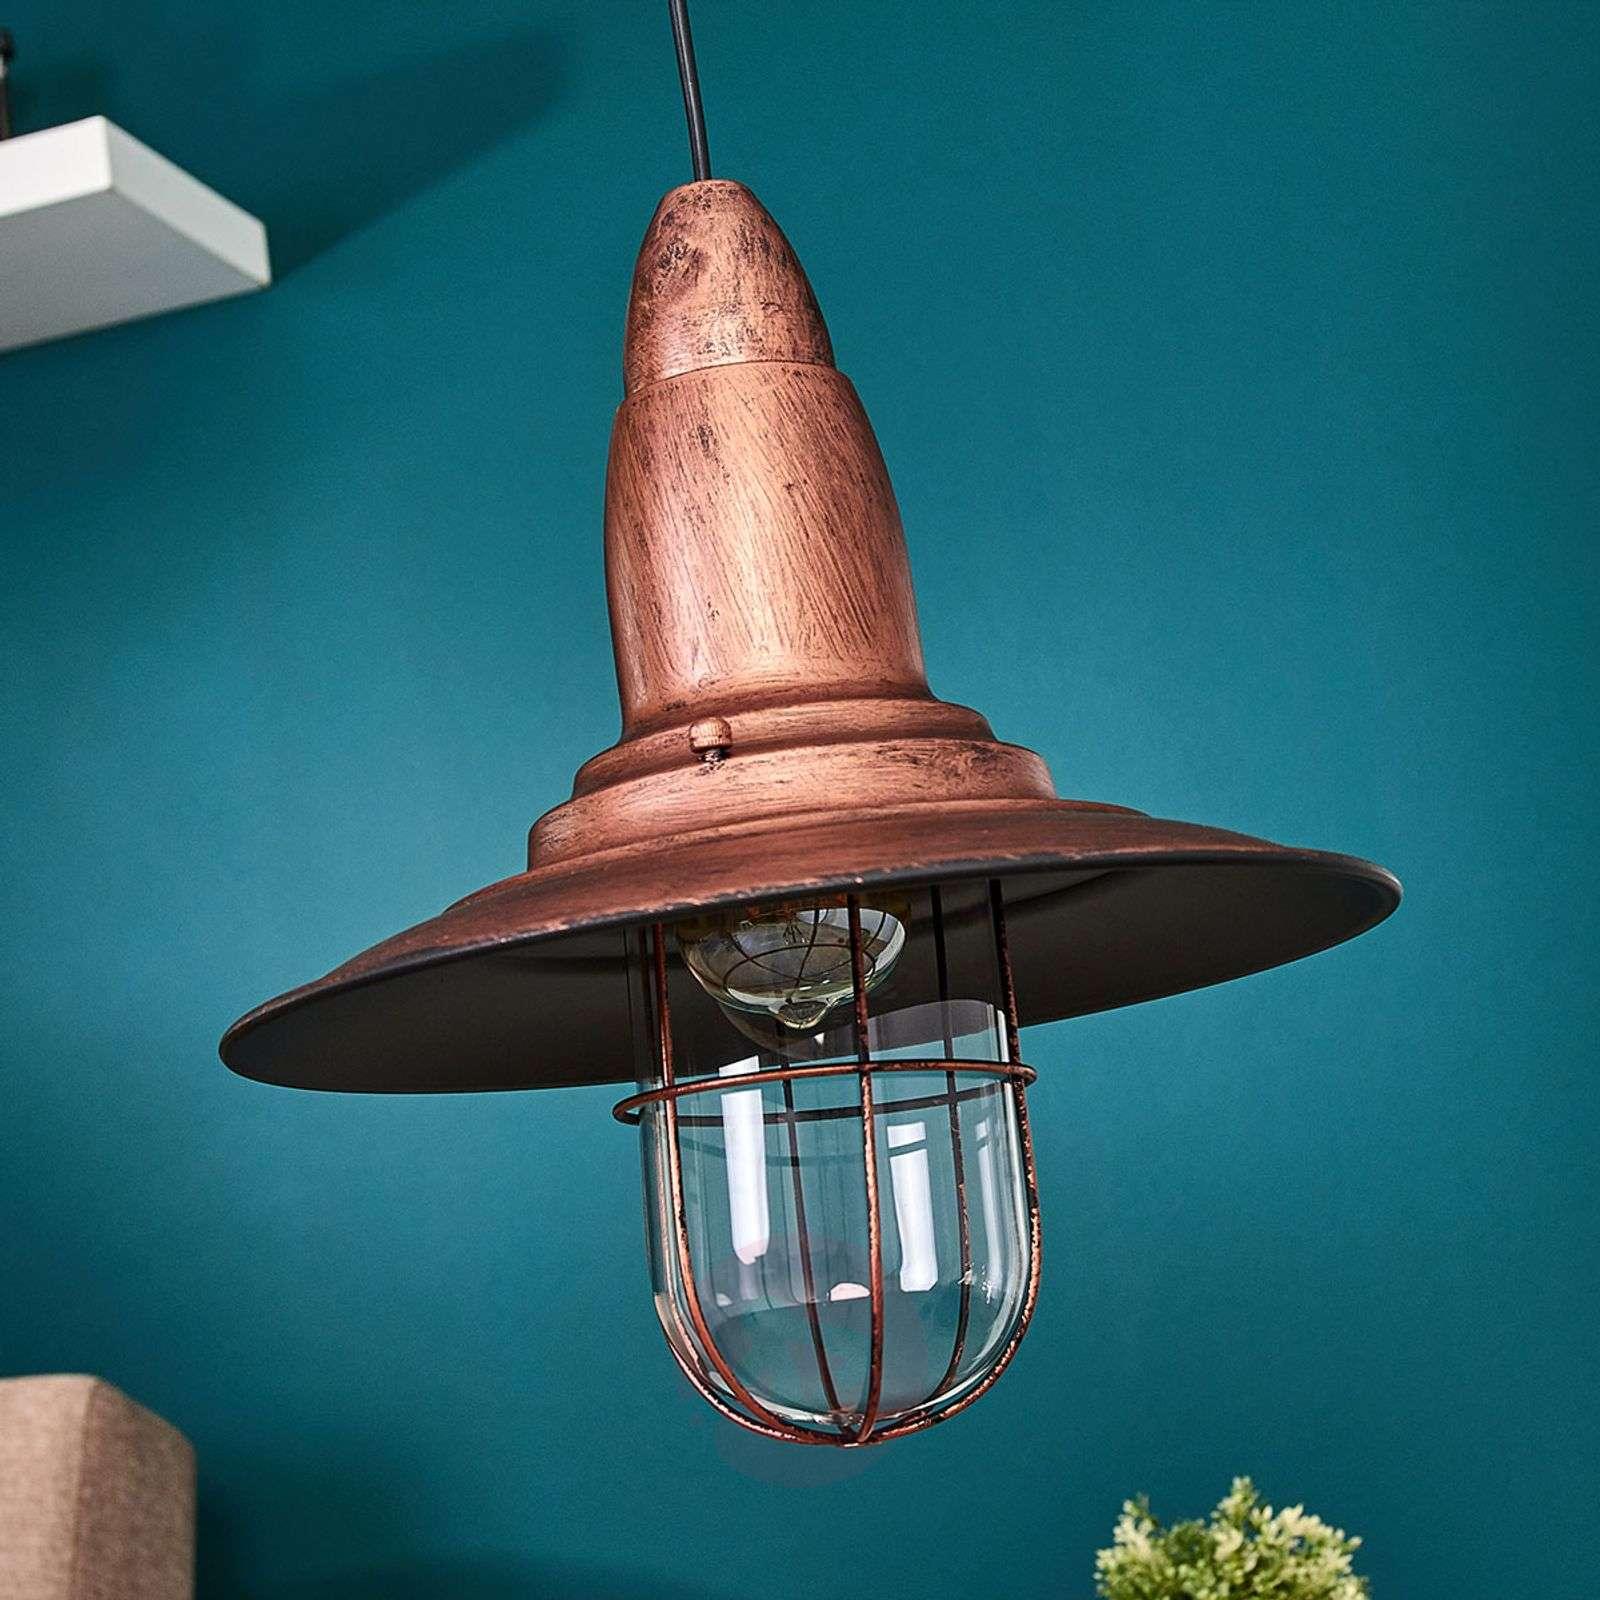 Fisherman Pendant Light W Antique Copper Finish 9005097 01